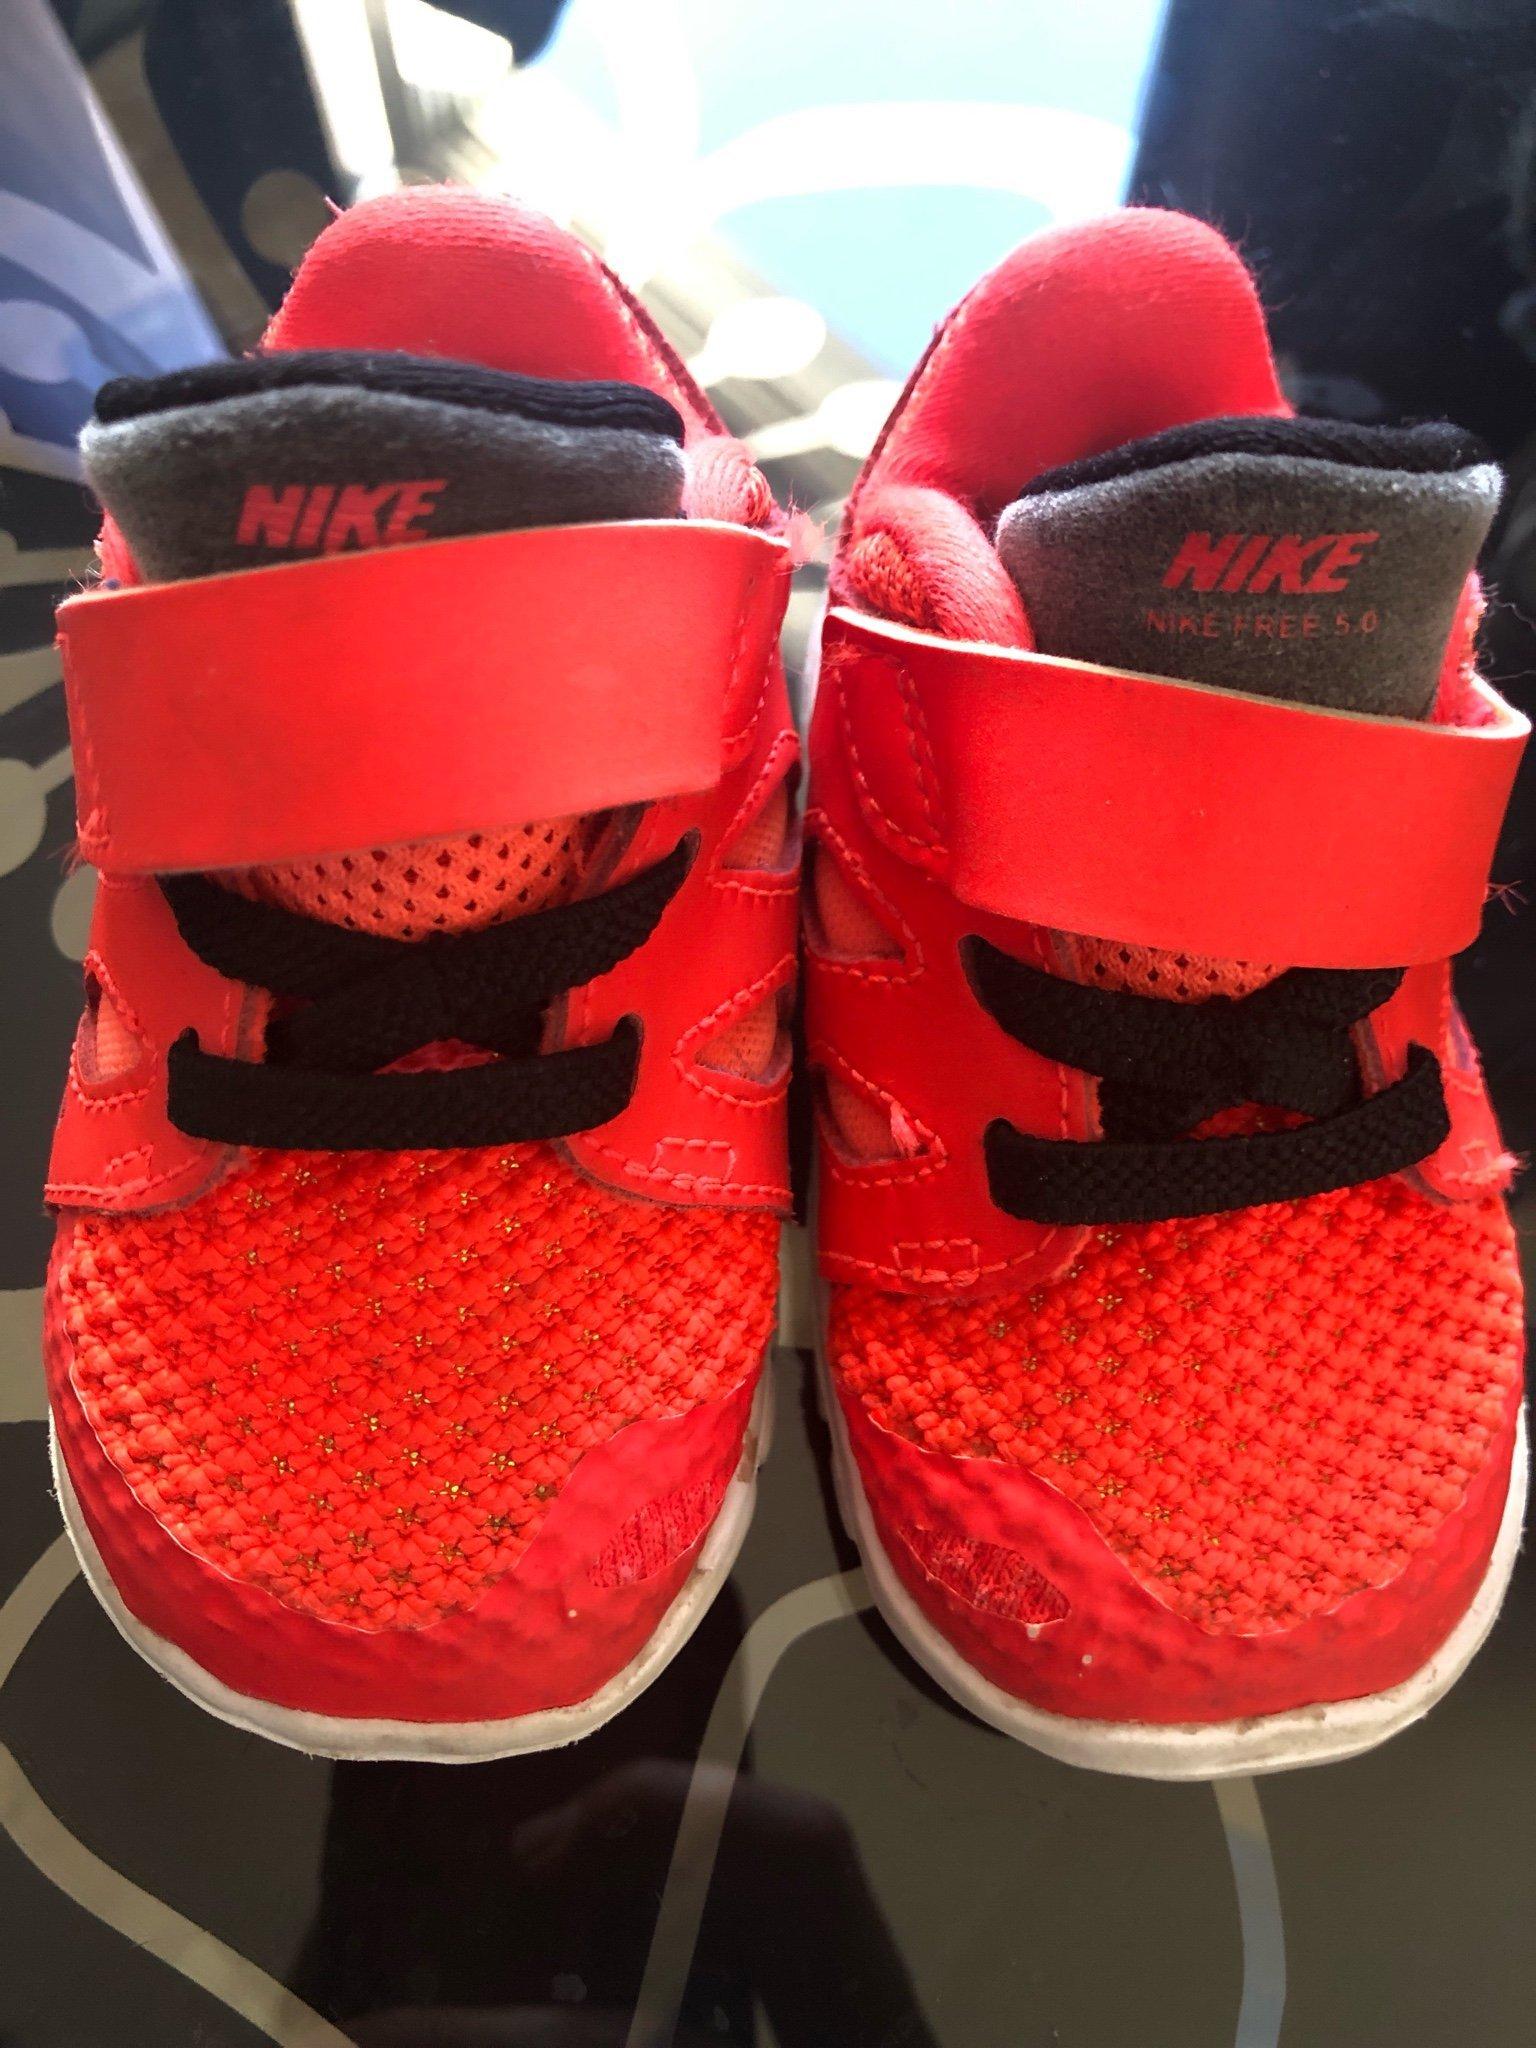 official photos 8a0d8 3efff Nike skor bebis (346244834) ᐈ Köp på Tradera